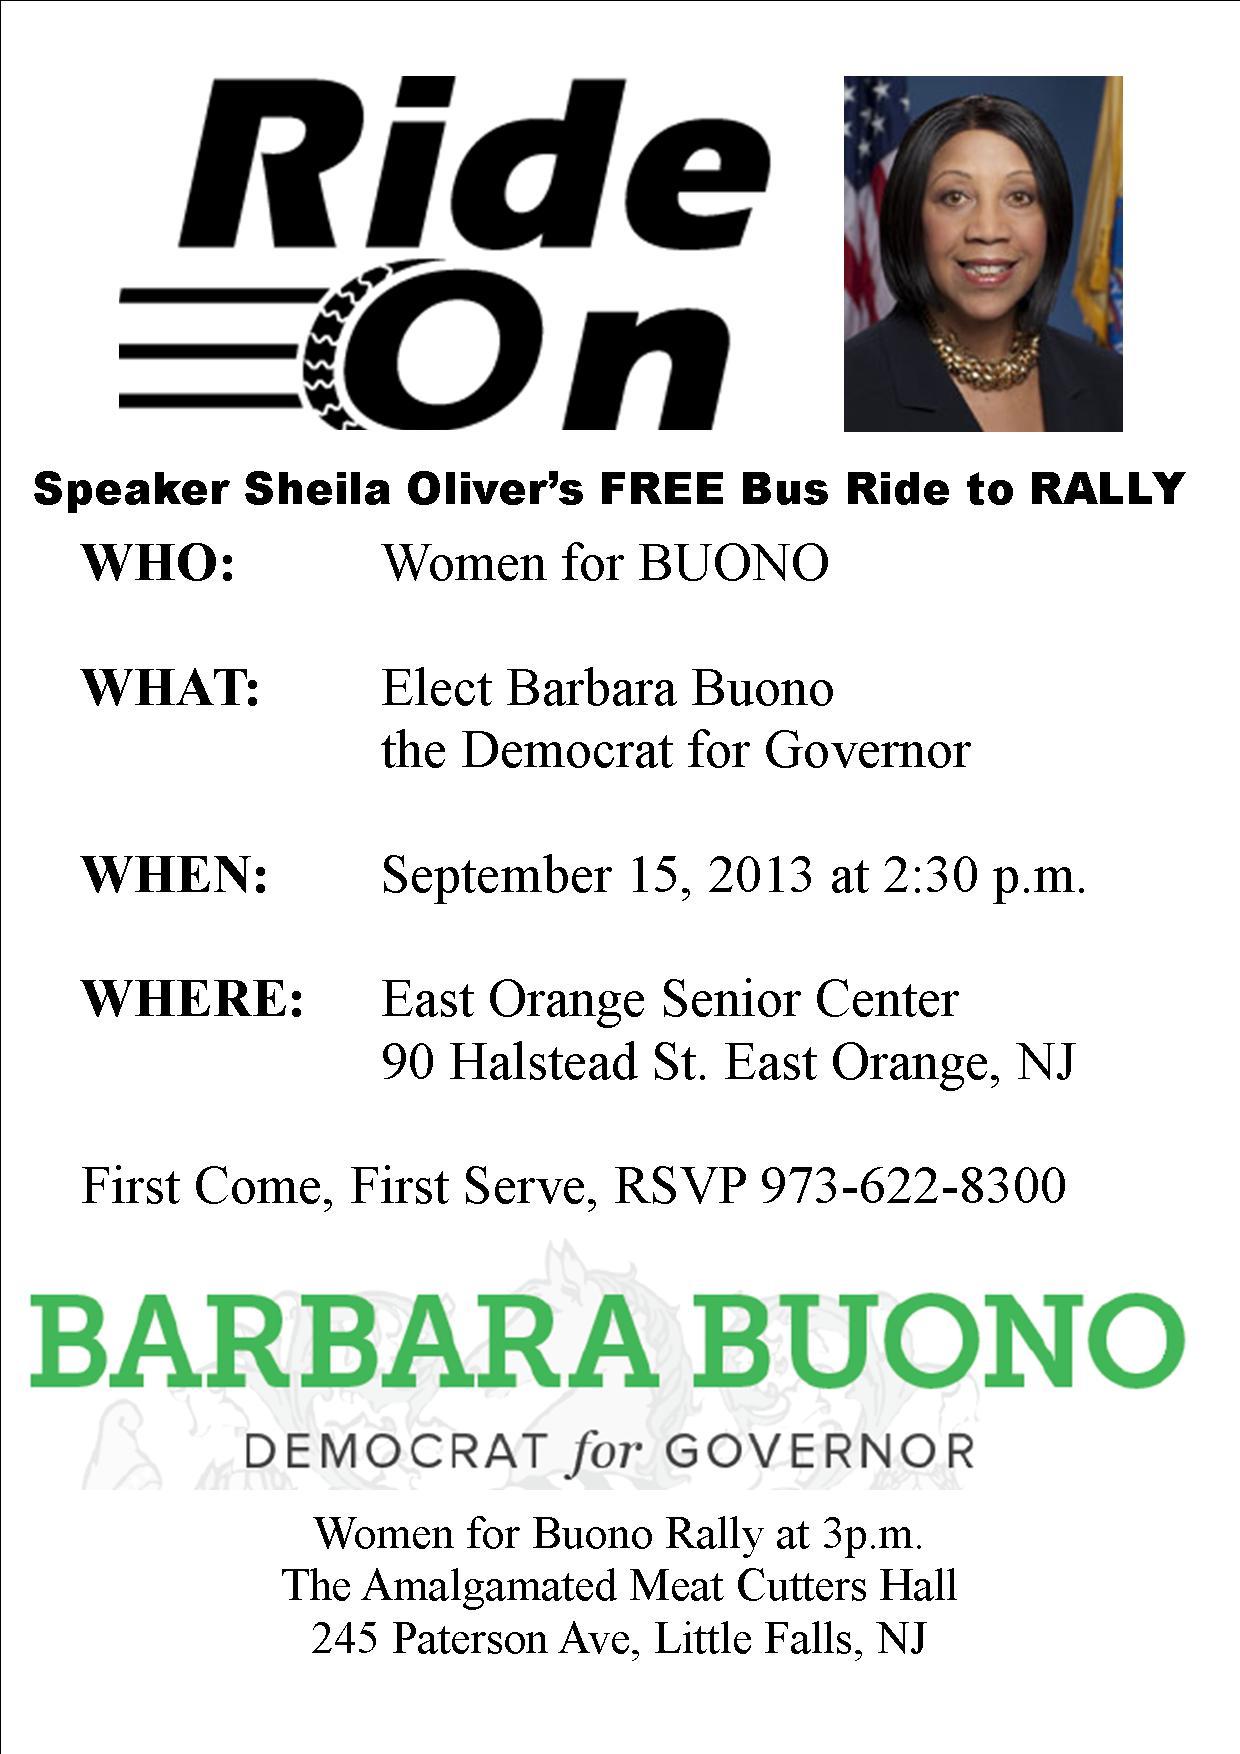 Women_for_Buono-Oliver_Bus_Ride.jpg